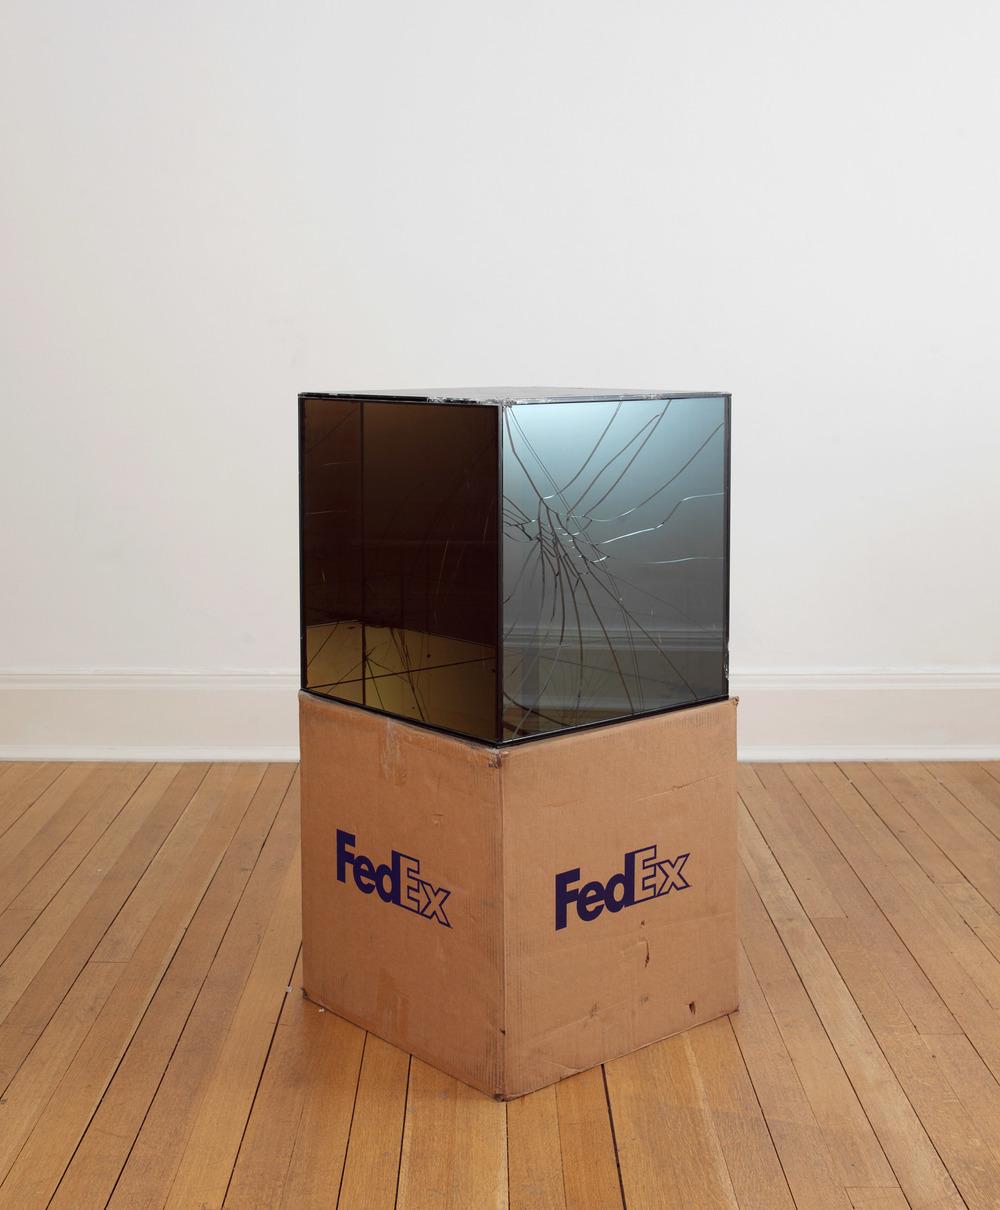 FedEx® Large Kraft Box 2008 FEDEX 330510 REV 6/08 GP, International Priority, Los Angeles–London trk#868587728072, October 02–05, 2009    2009–   Laminated Mirropane, FedEx shipping box, accrued FedEx shipping and tracking labels, silicone, metal, tape  20 x 20 x 20 inches   Production Stills, 2009